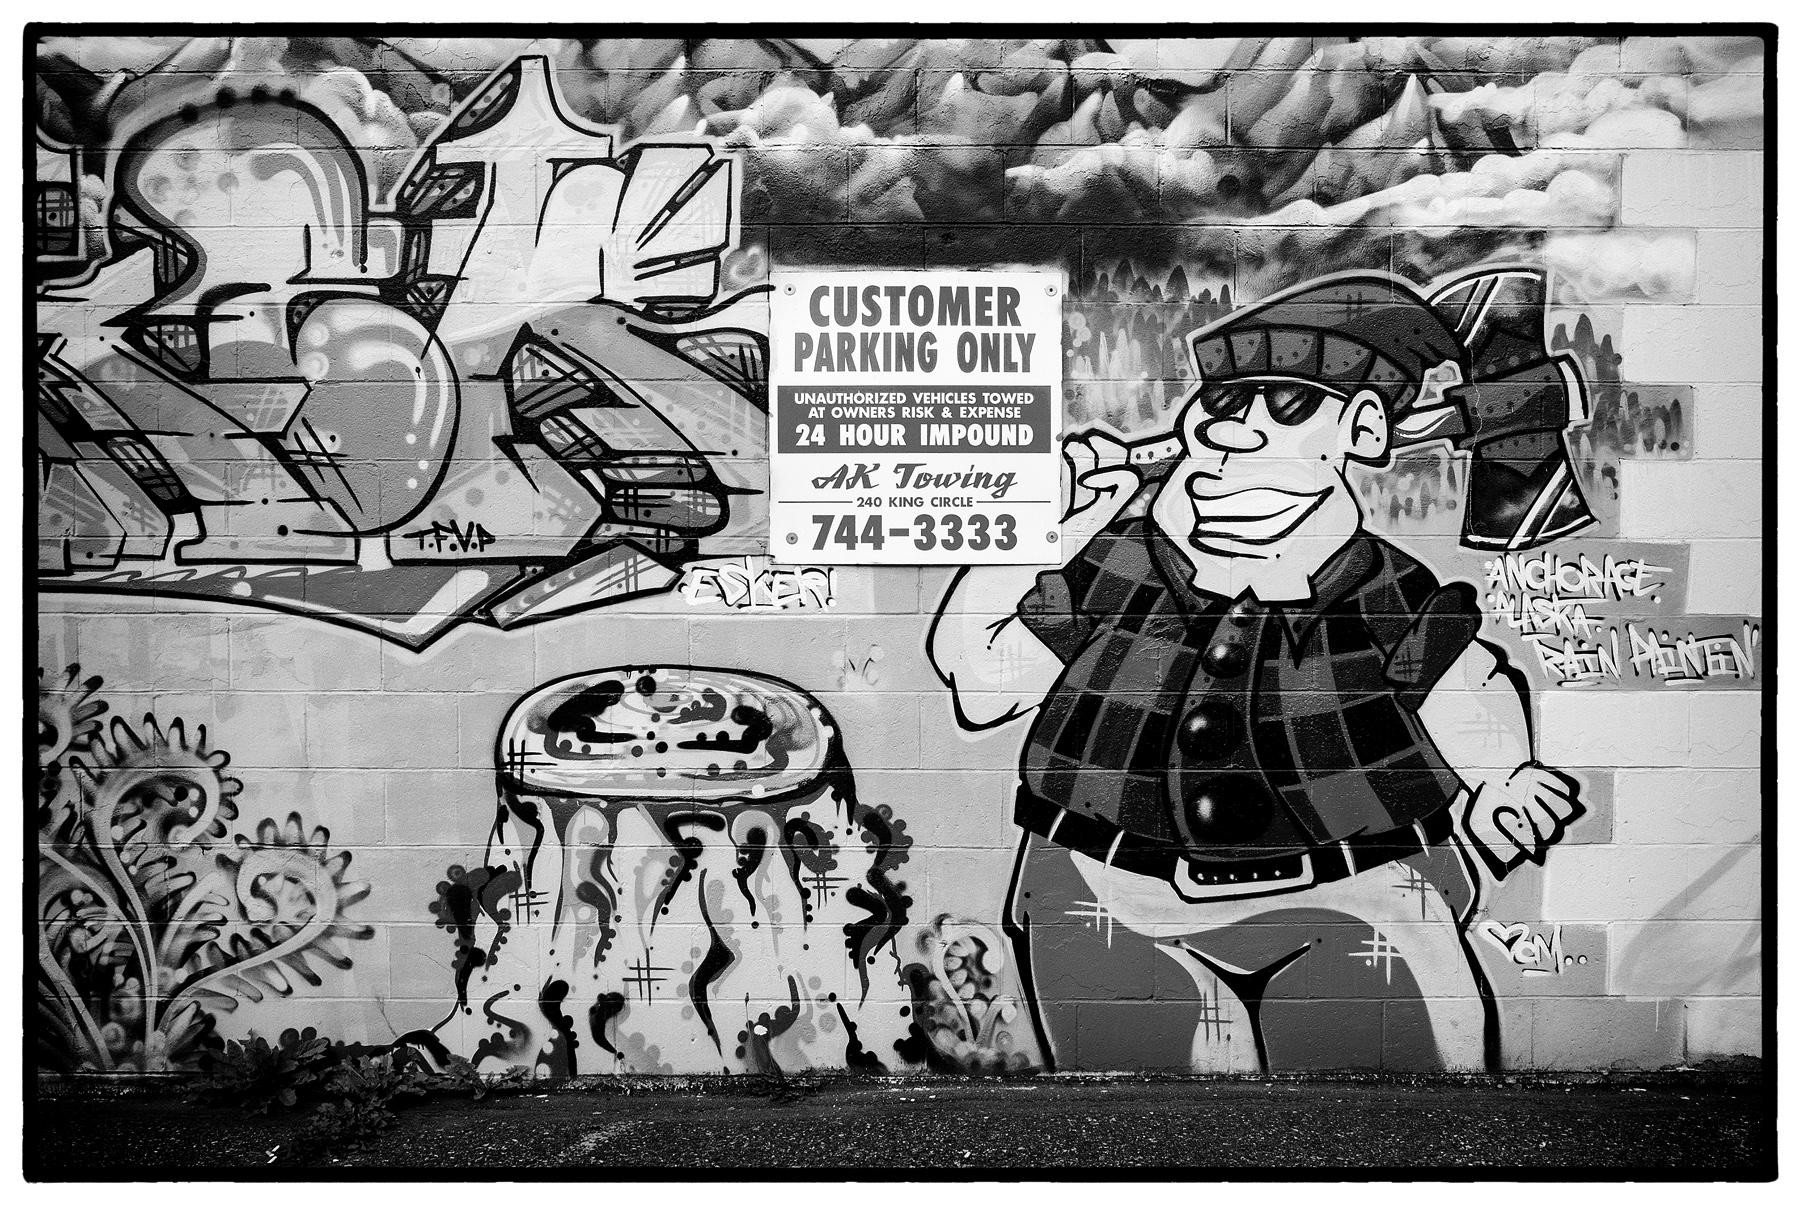 Pete's Tobacco Shop Mural in B&W by bensonga in bensonga